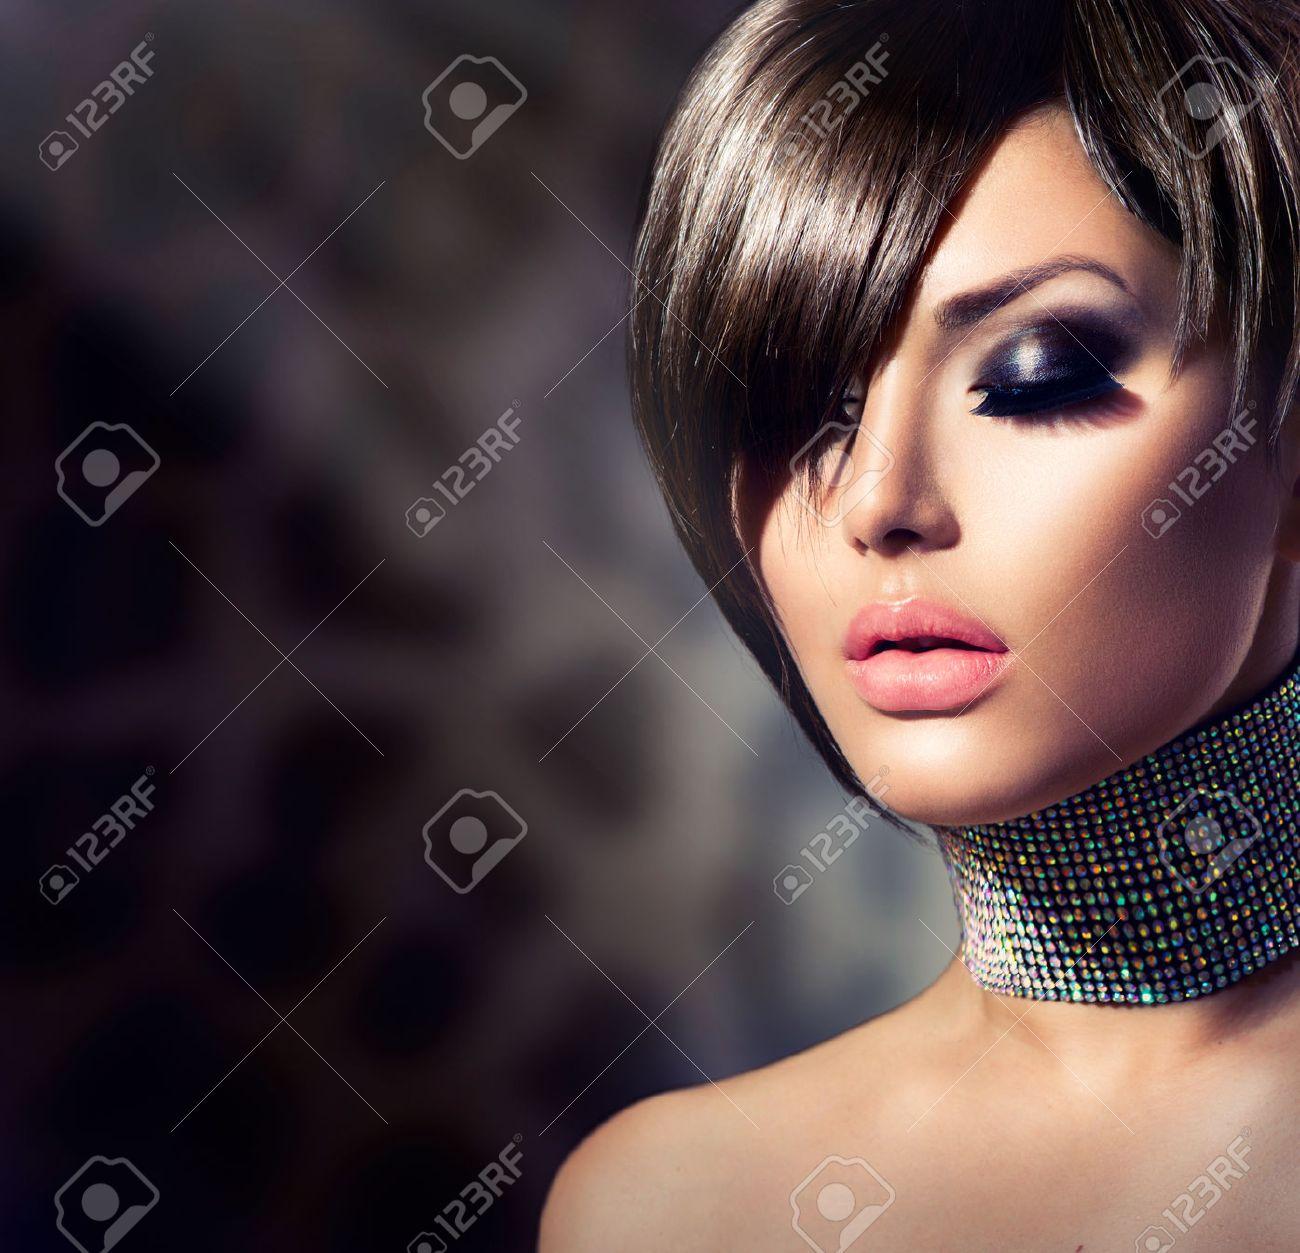 Fashion Beauty Woman Portrait Stock Photo - 24939623